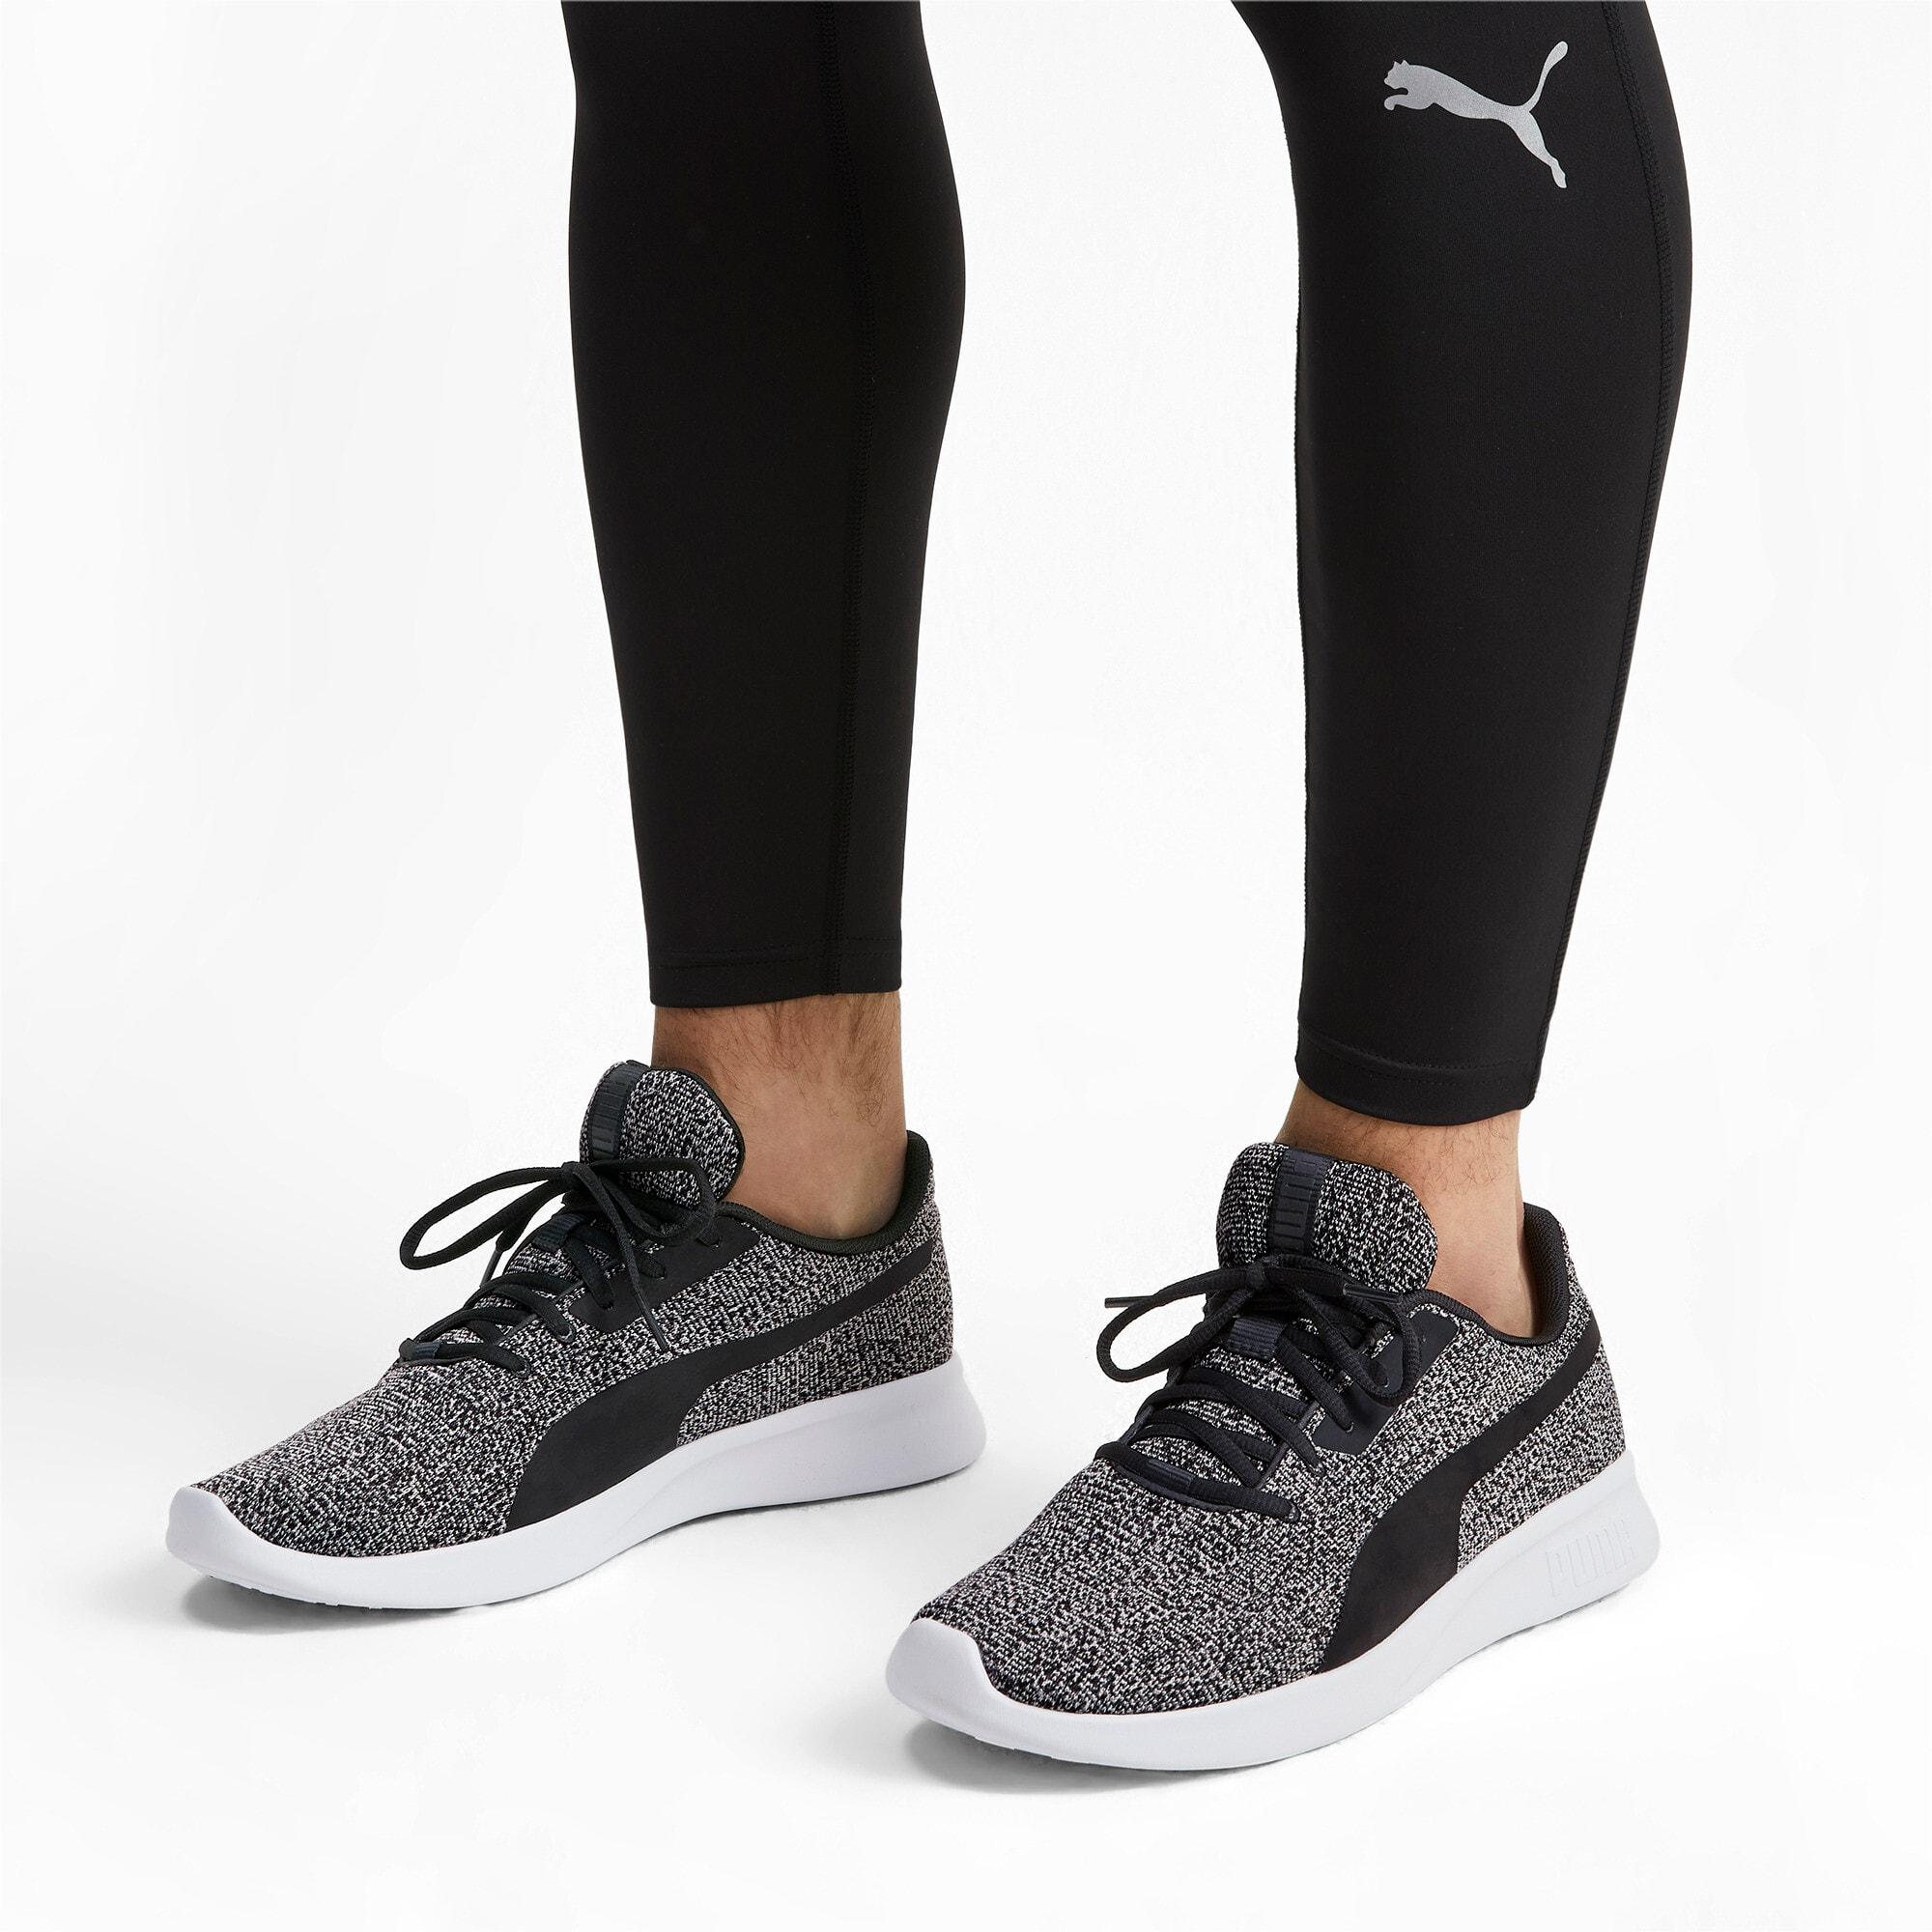 Thumbnail 2 of Modern Runner Sneakers, Gray Violet-Puma Black, medium-IND